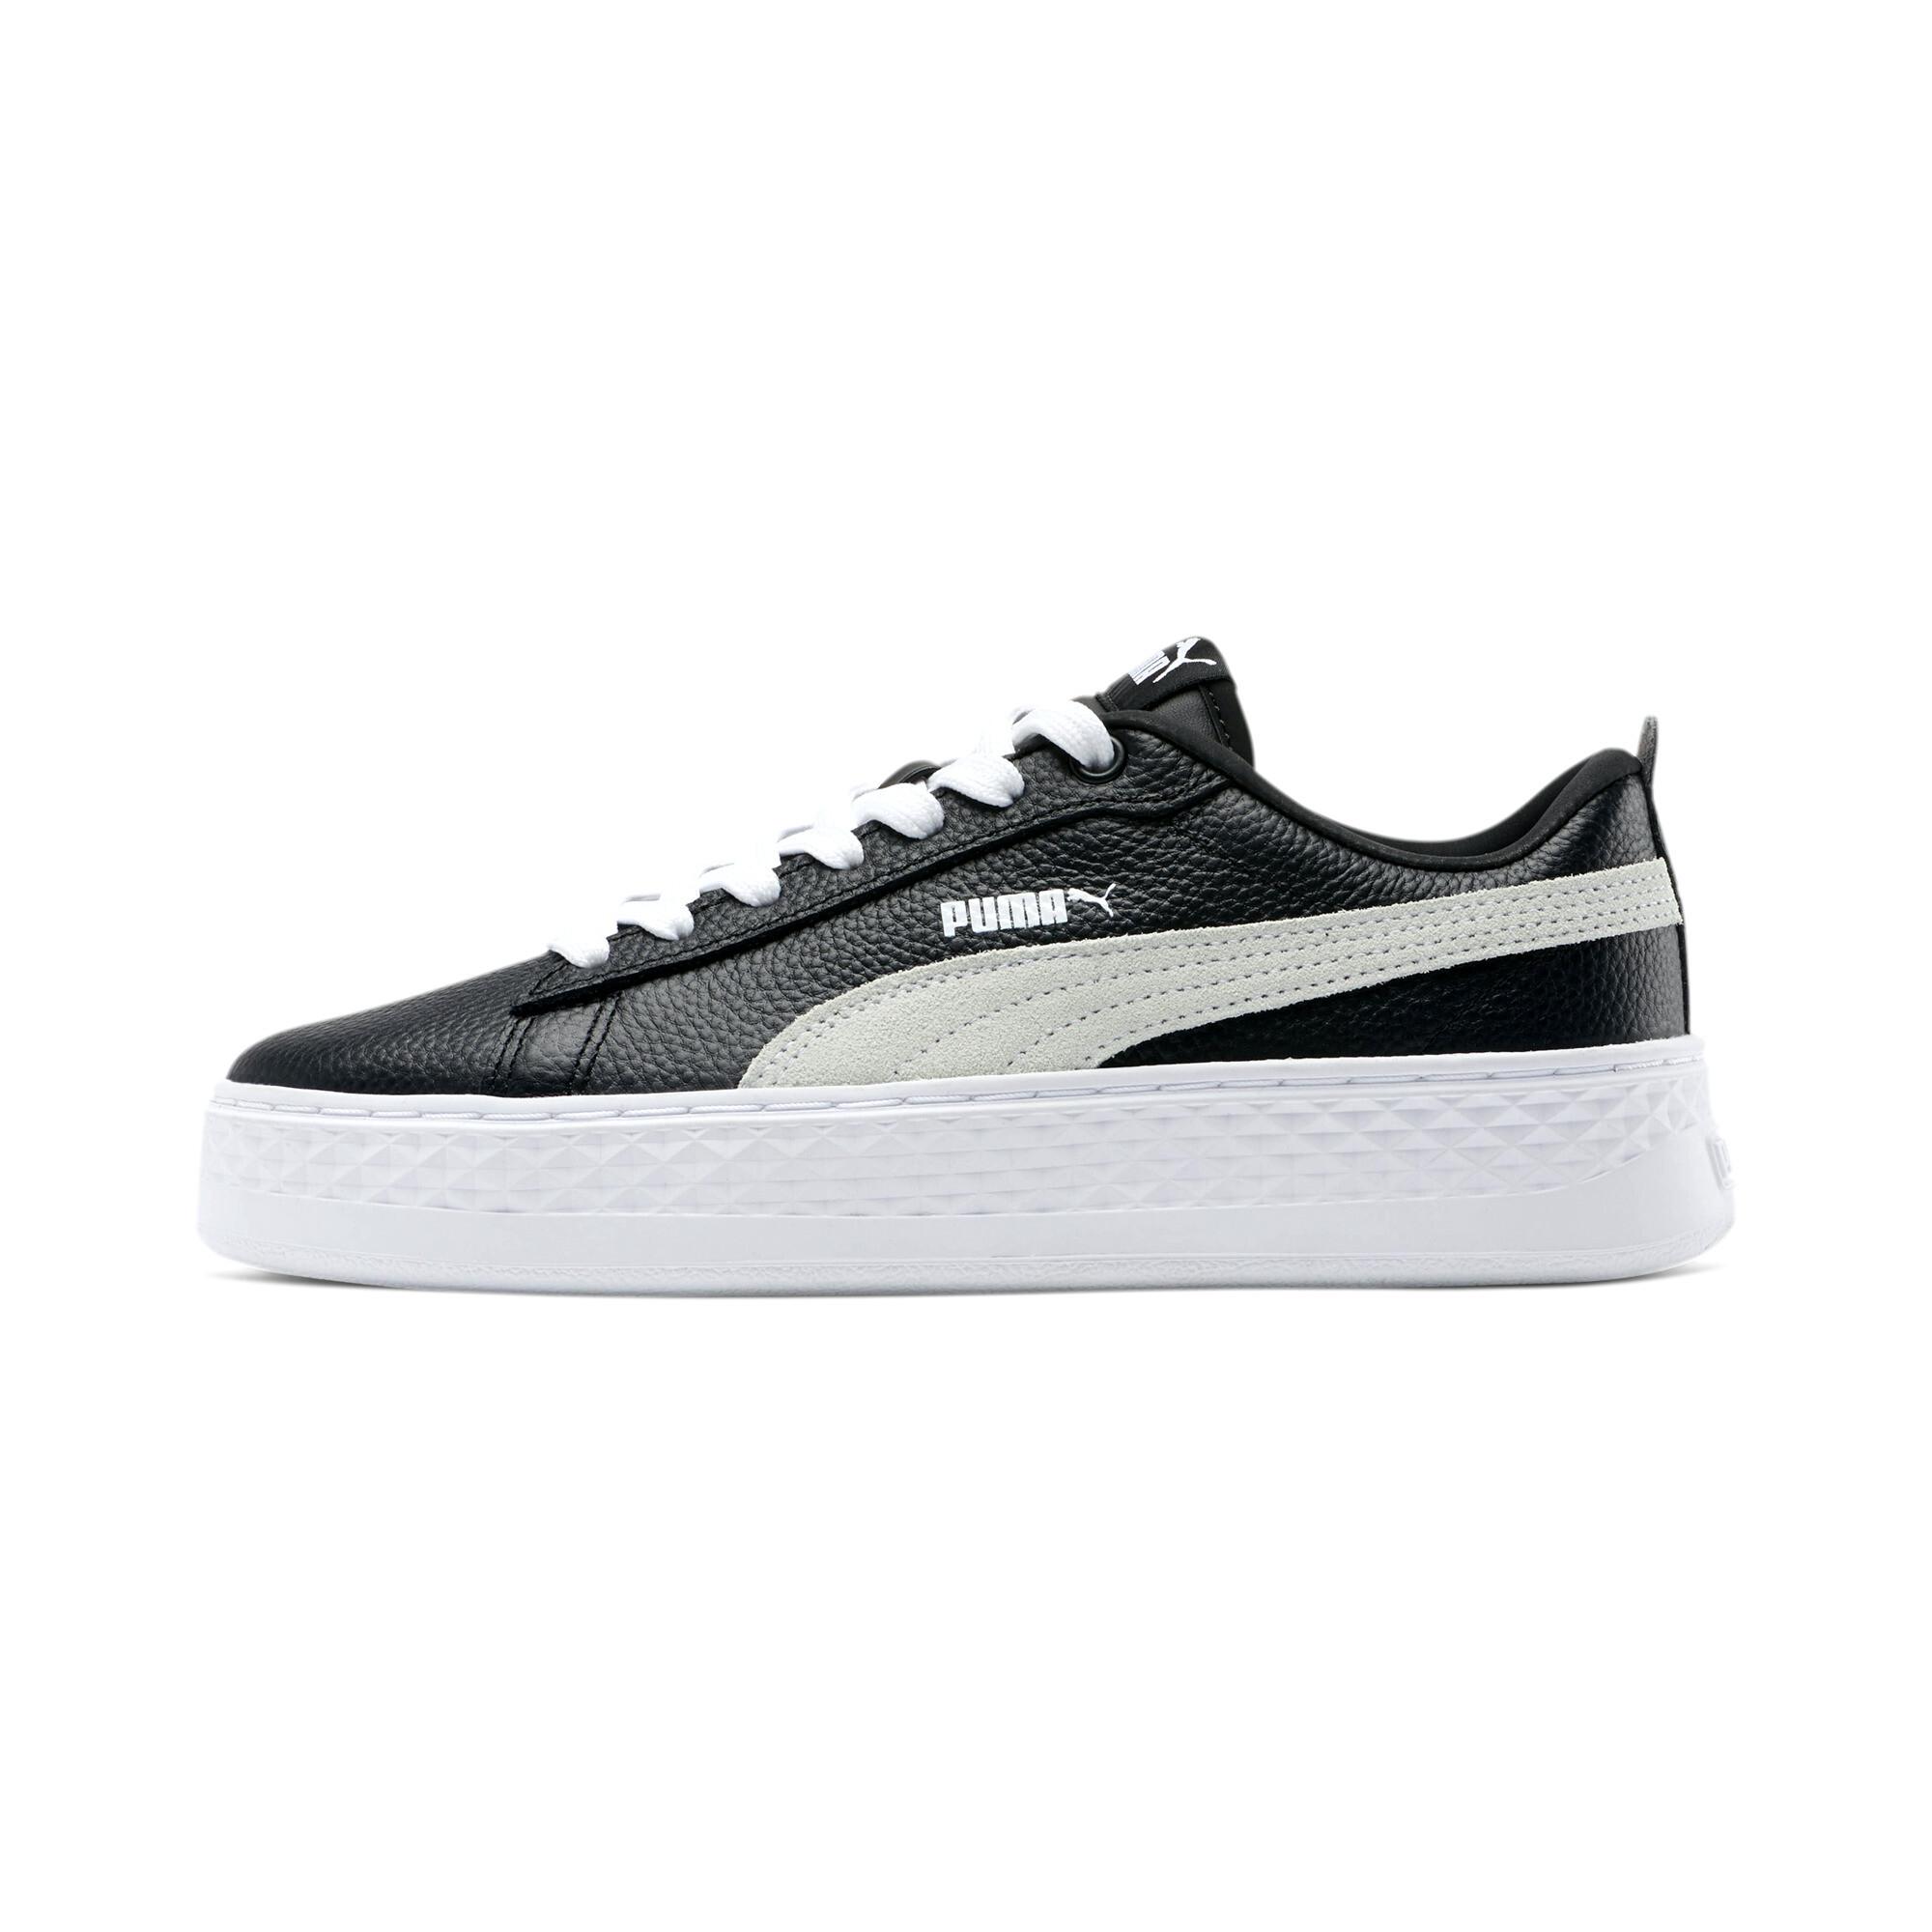 PUMA-Smash-Platform-Leather-Women-039-s-Sneakers-Women-Shoe-Basics thumbnail 19